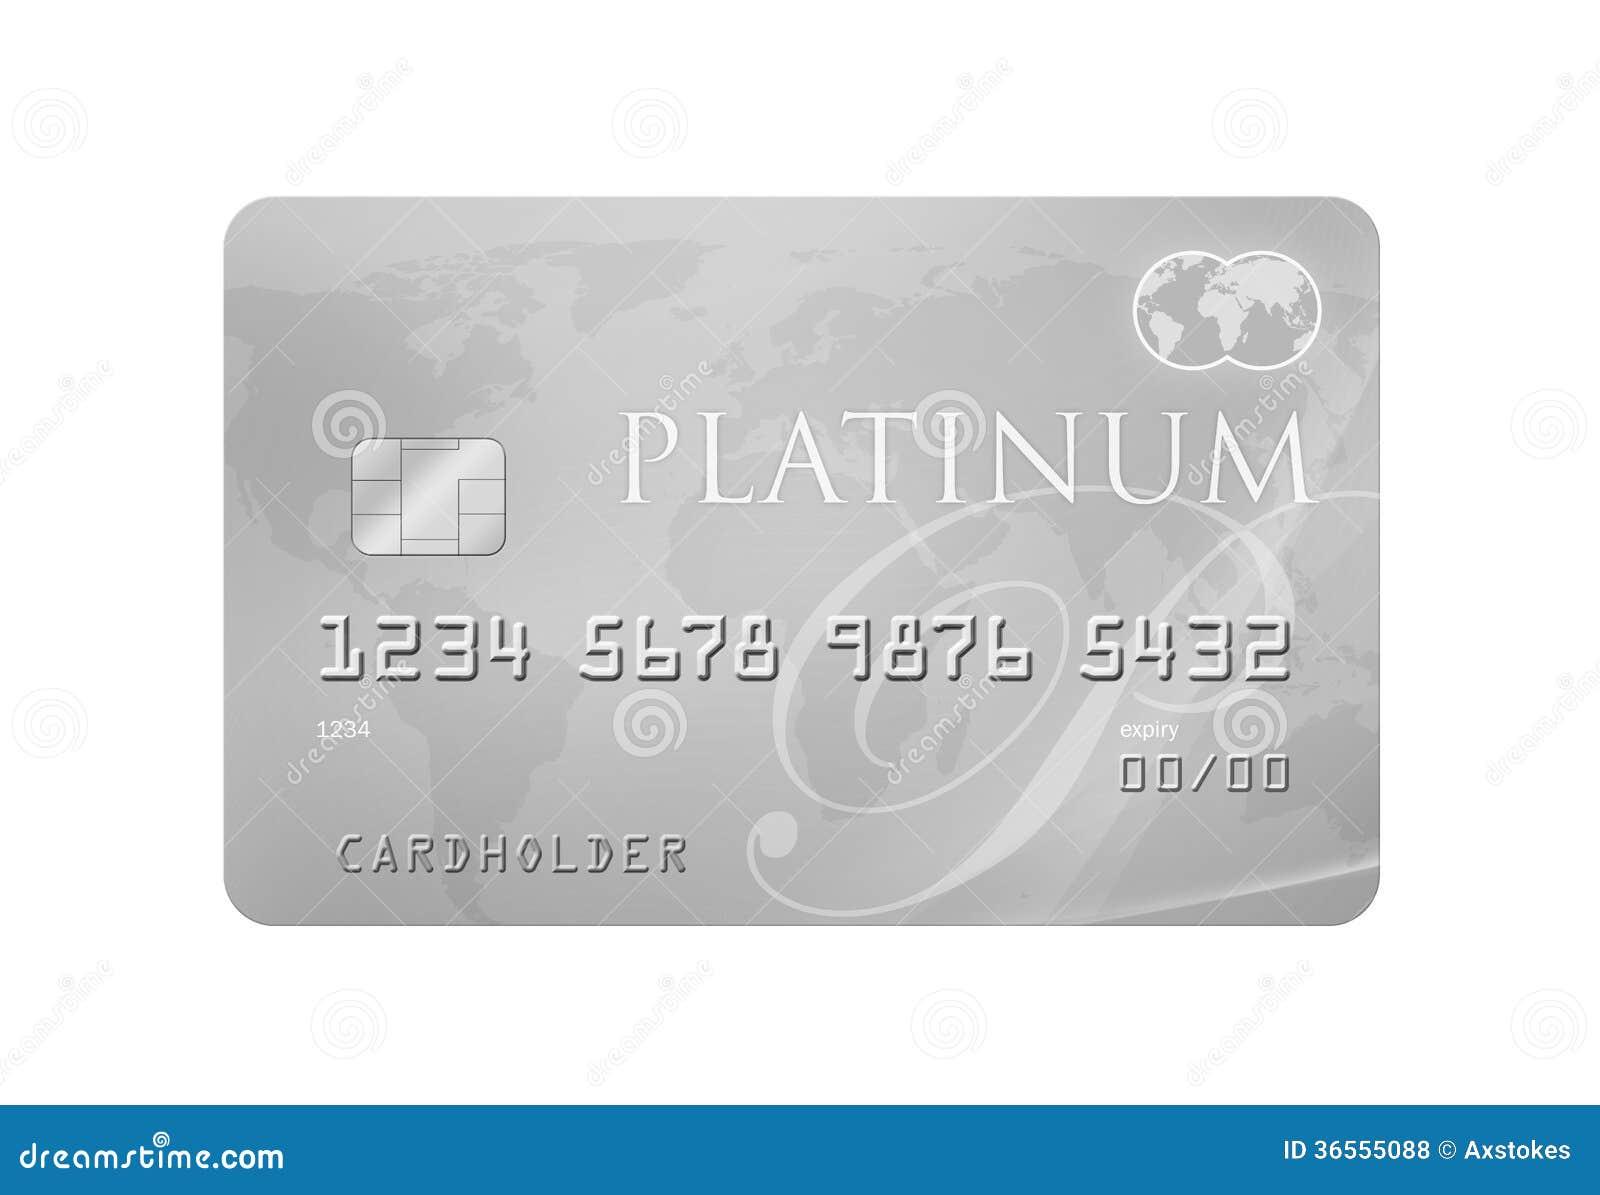 platinum credit card royalty free stock photos image 36555088. Black Bedroom Furniture Sets. Home Design Ideas